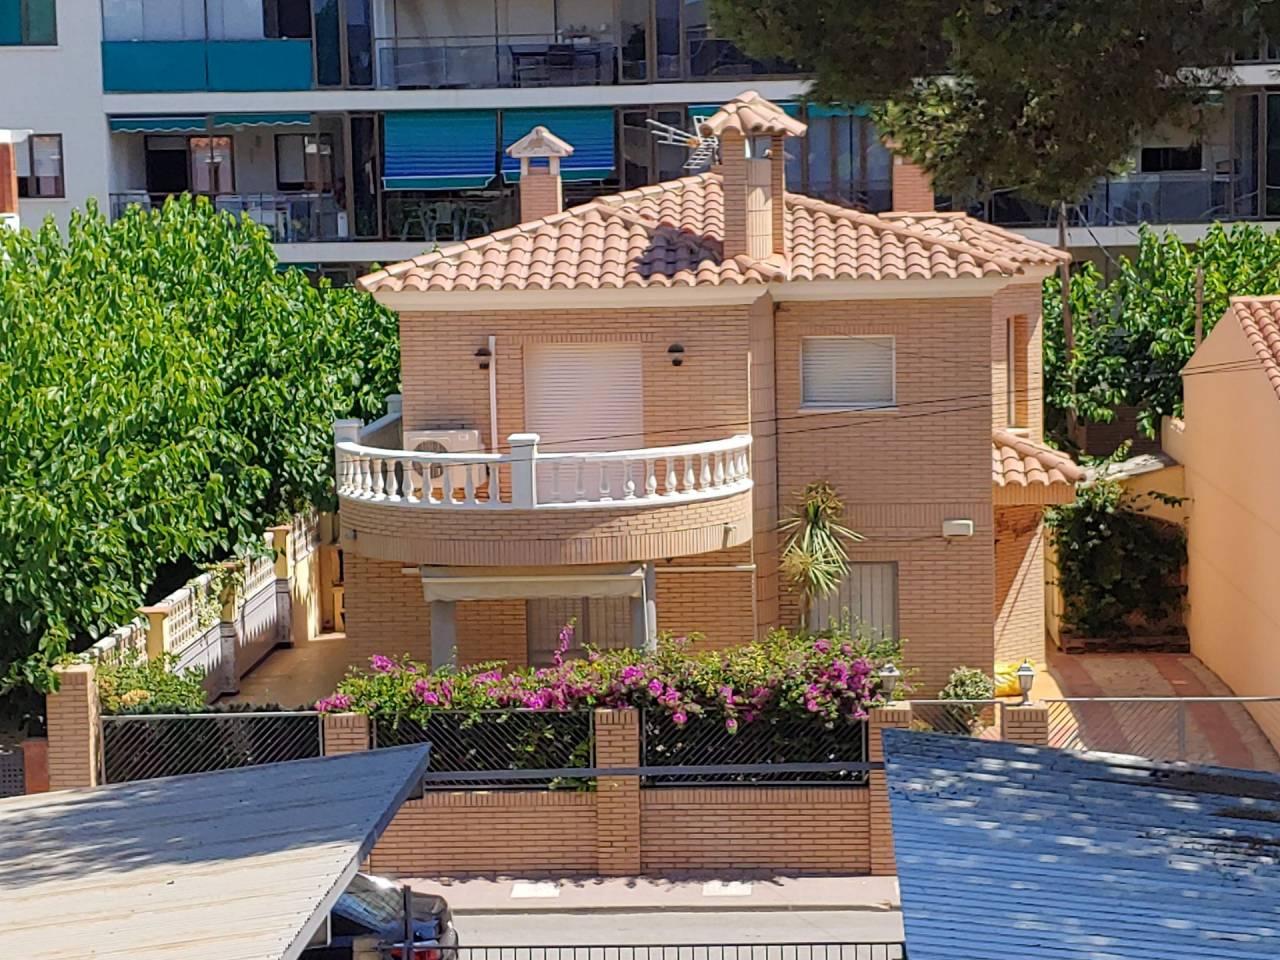 Alquiler de Temporada Casa  Calle andromeda, 8. Esplendida casa junto al mar. la casa situada a solo 20 metros d